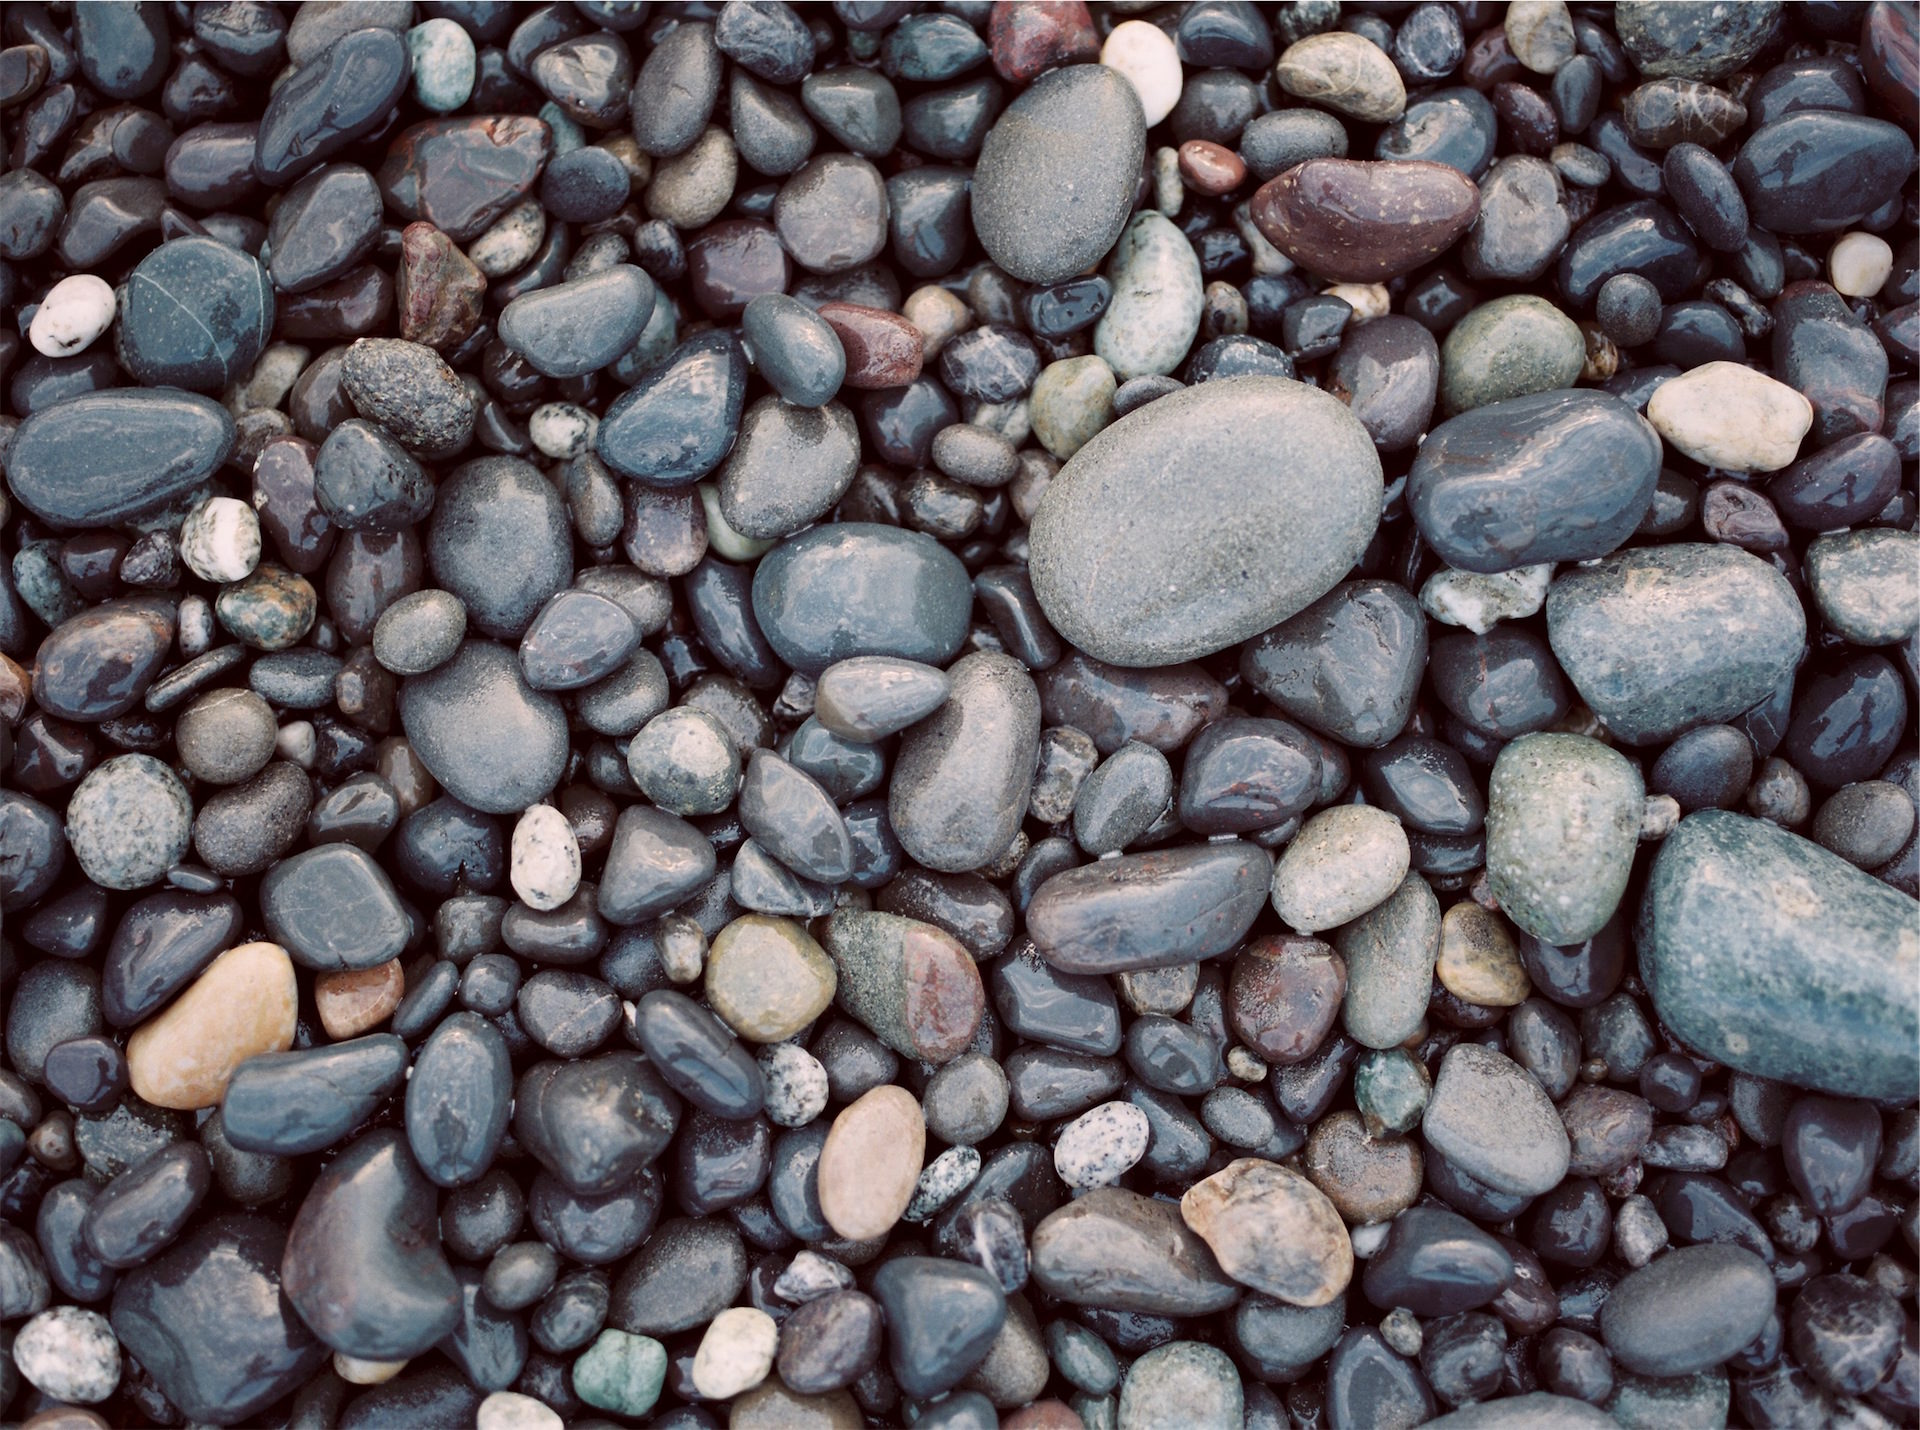 piedras, playa, agua, caos, formas - Fondos de Pantalla HD - professor-falken.com